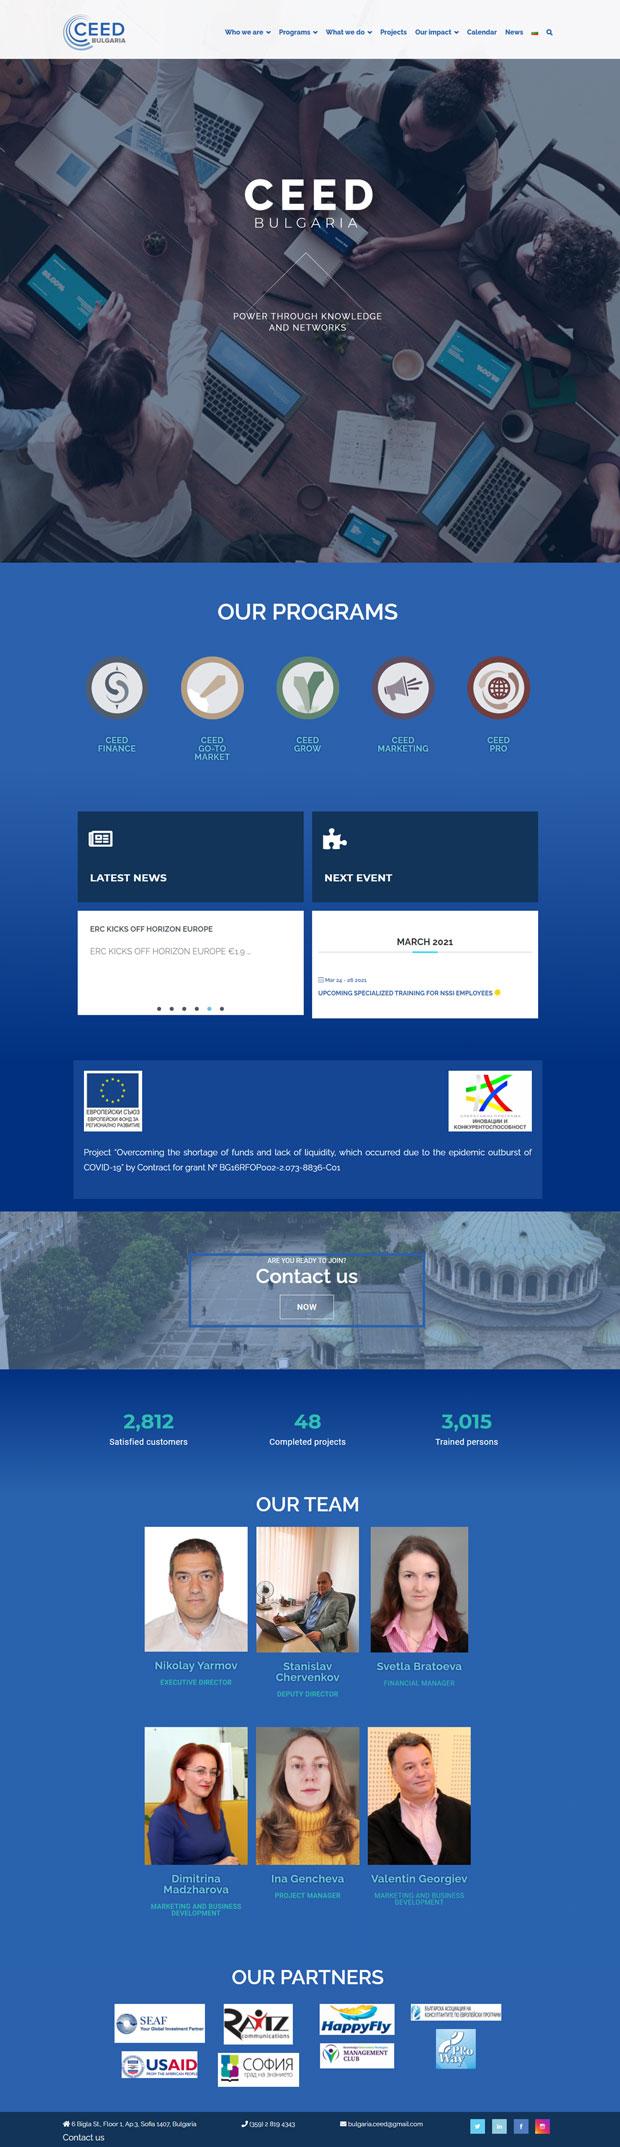 ceed_web_page_by_raitz2